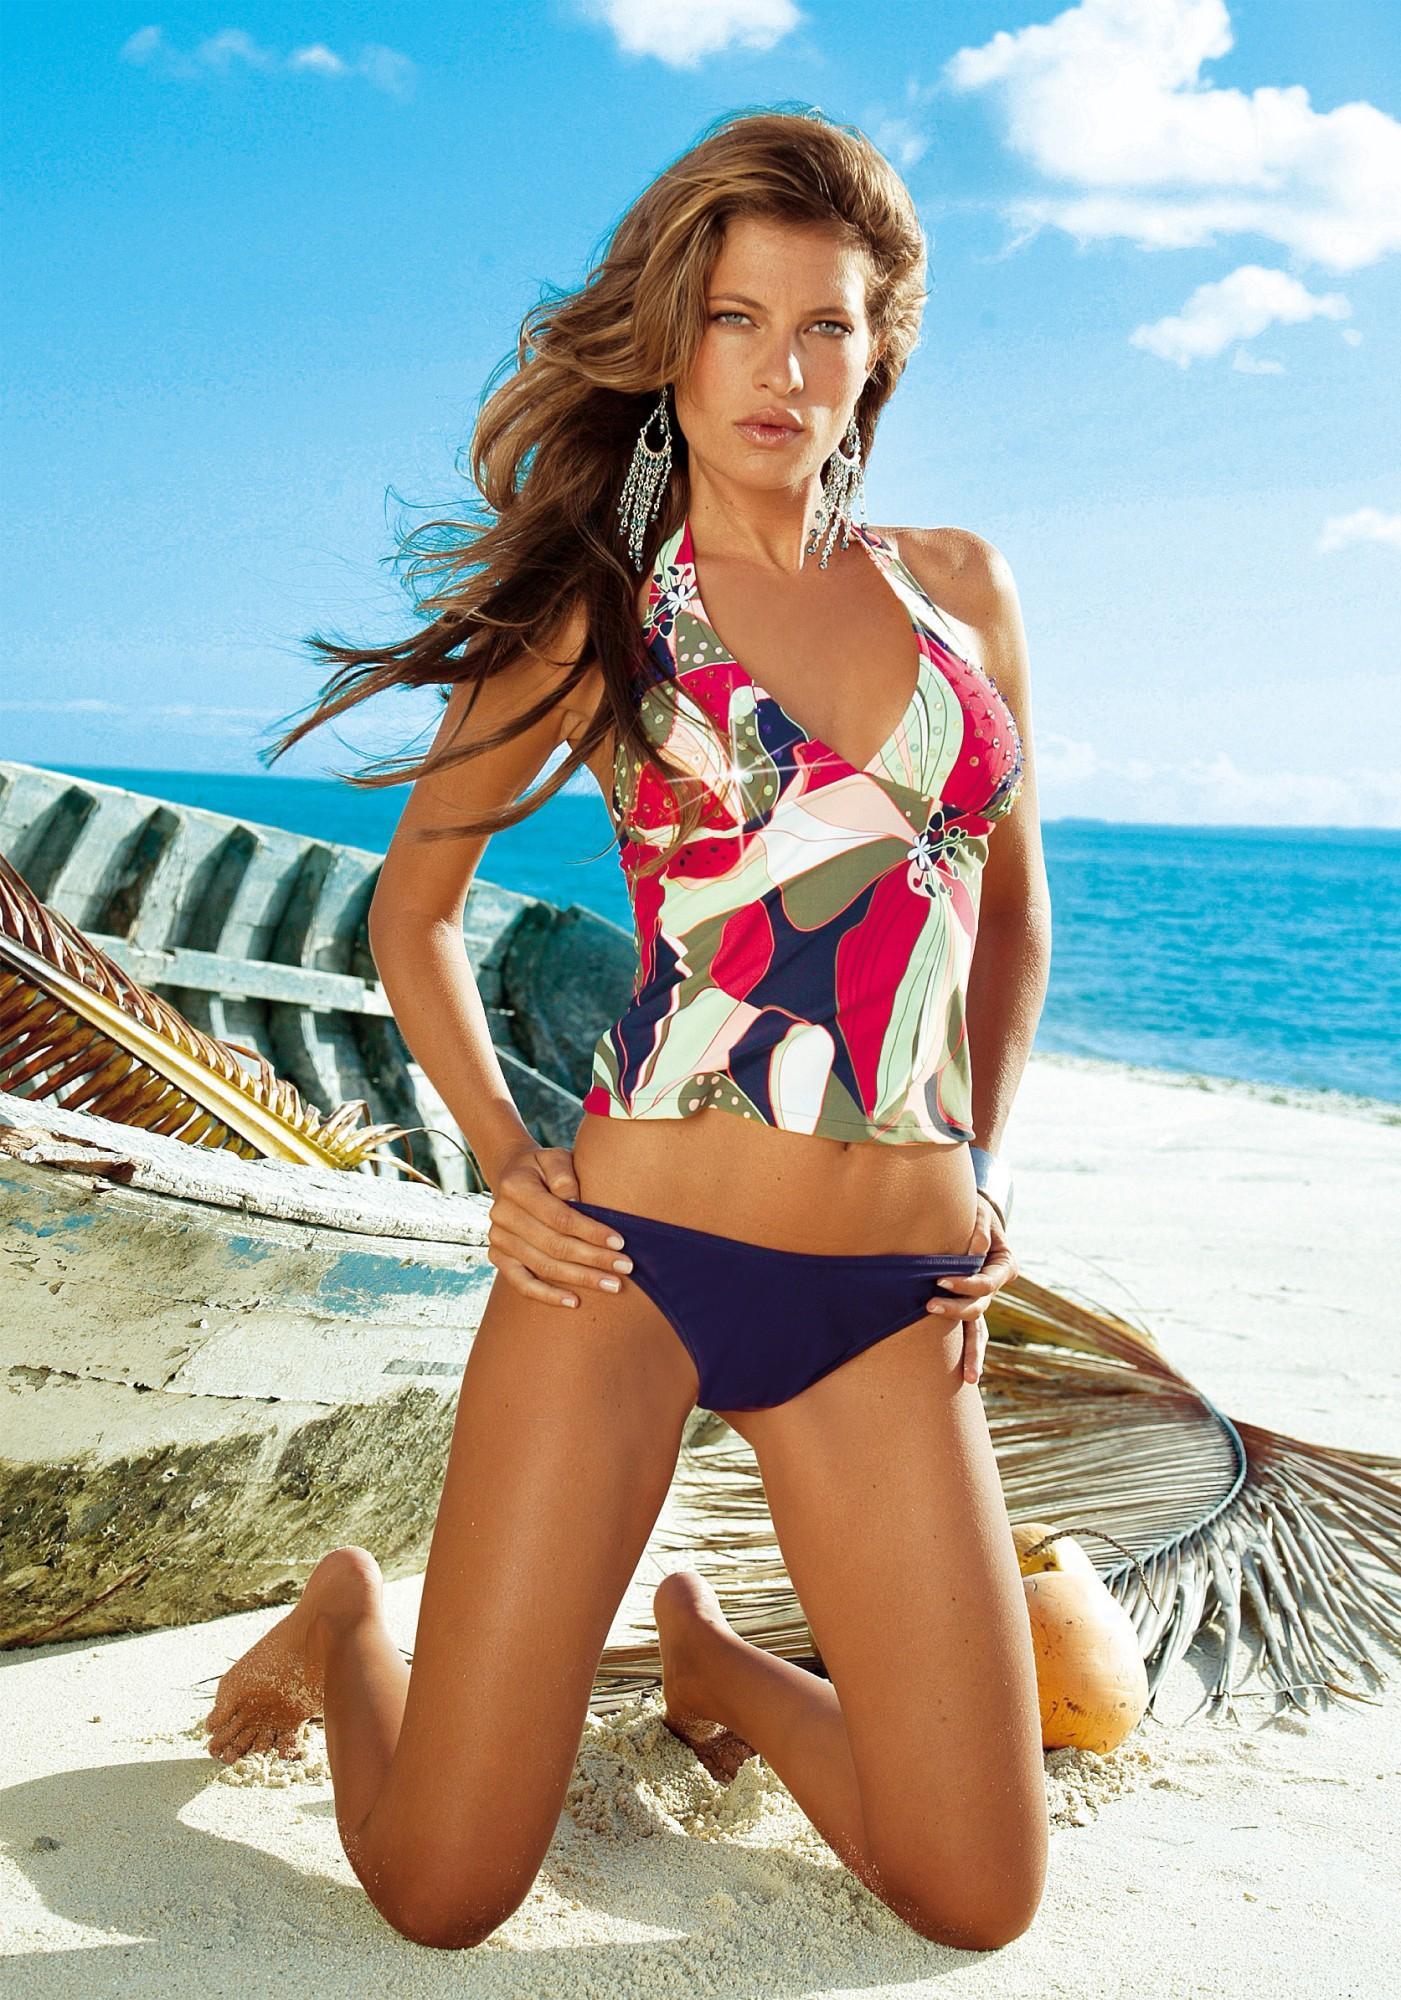 bruna magagna – unknown bikini photoshoot | swimsuit photo part 2